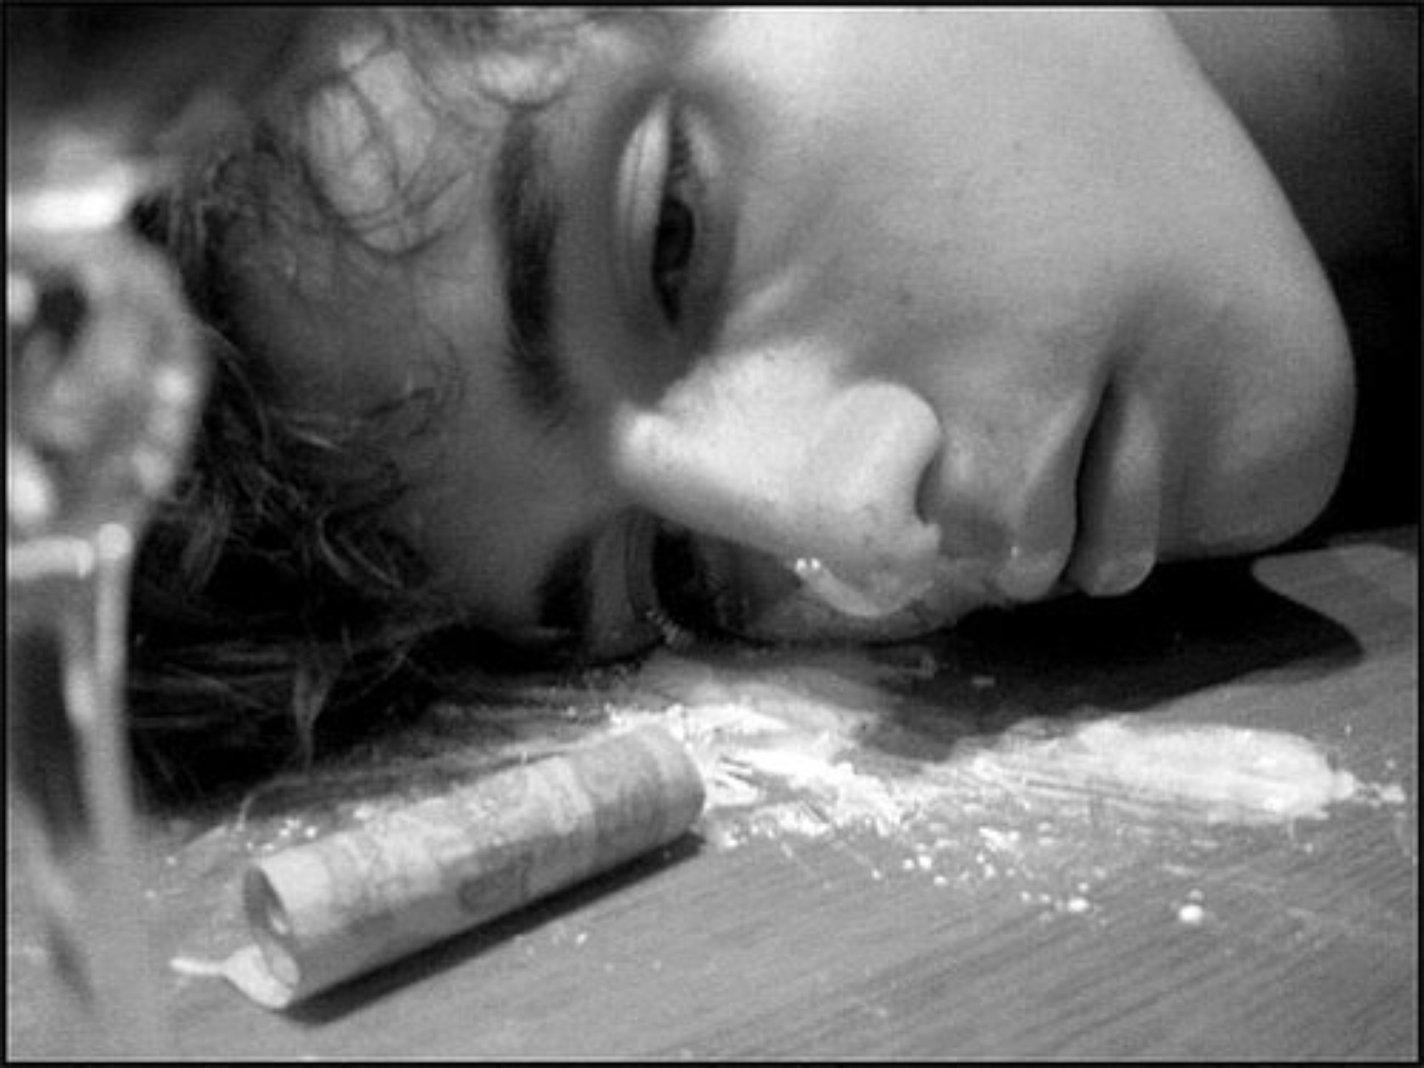 The dangers of amphetamine